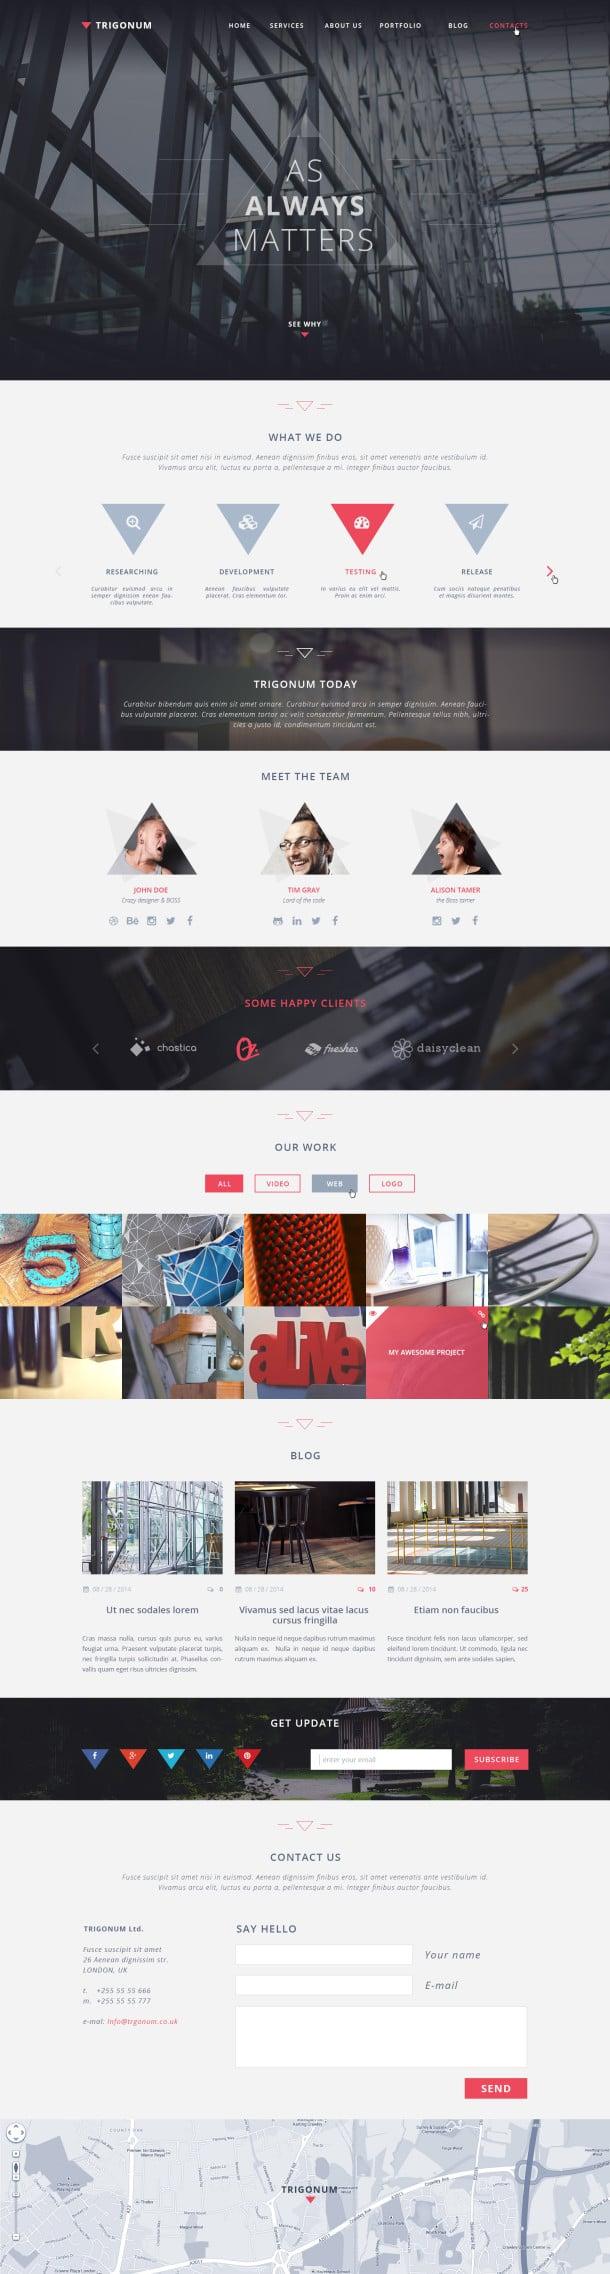 Trigonum – Free One Page Web Template PSD